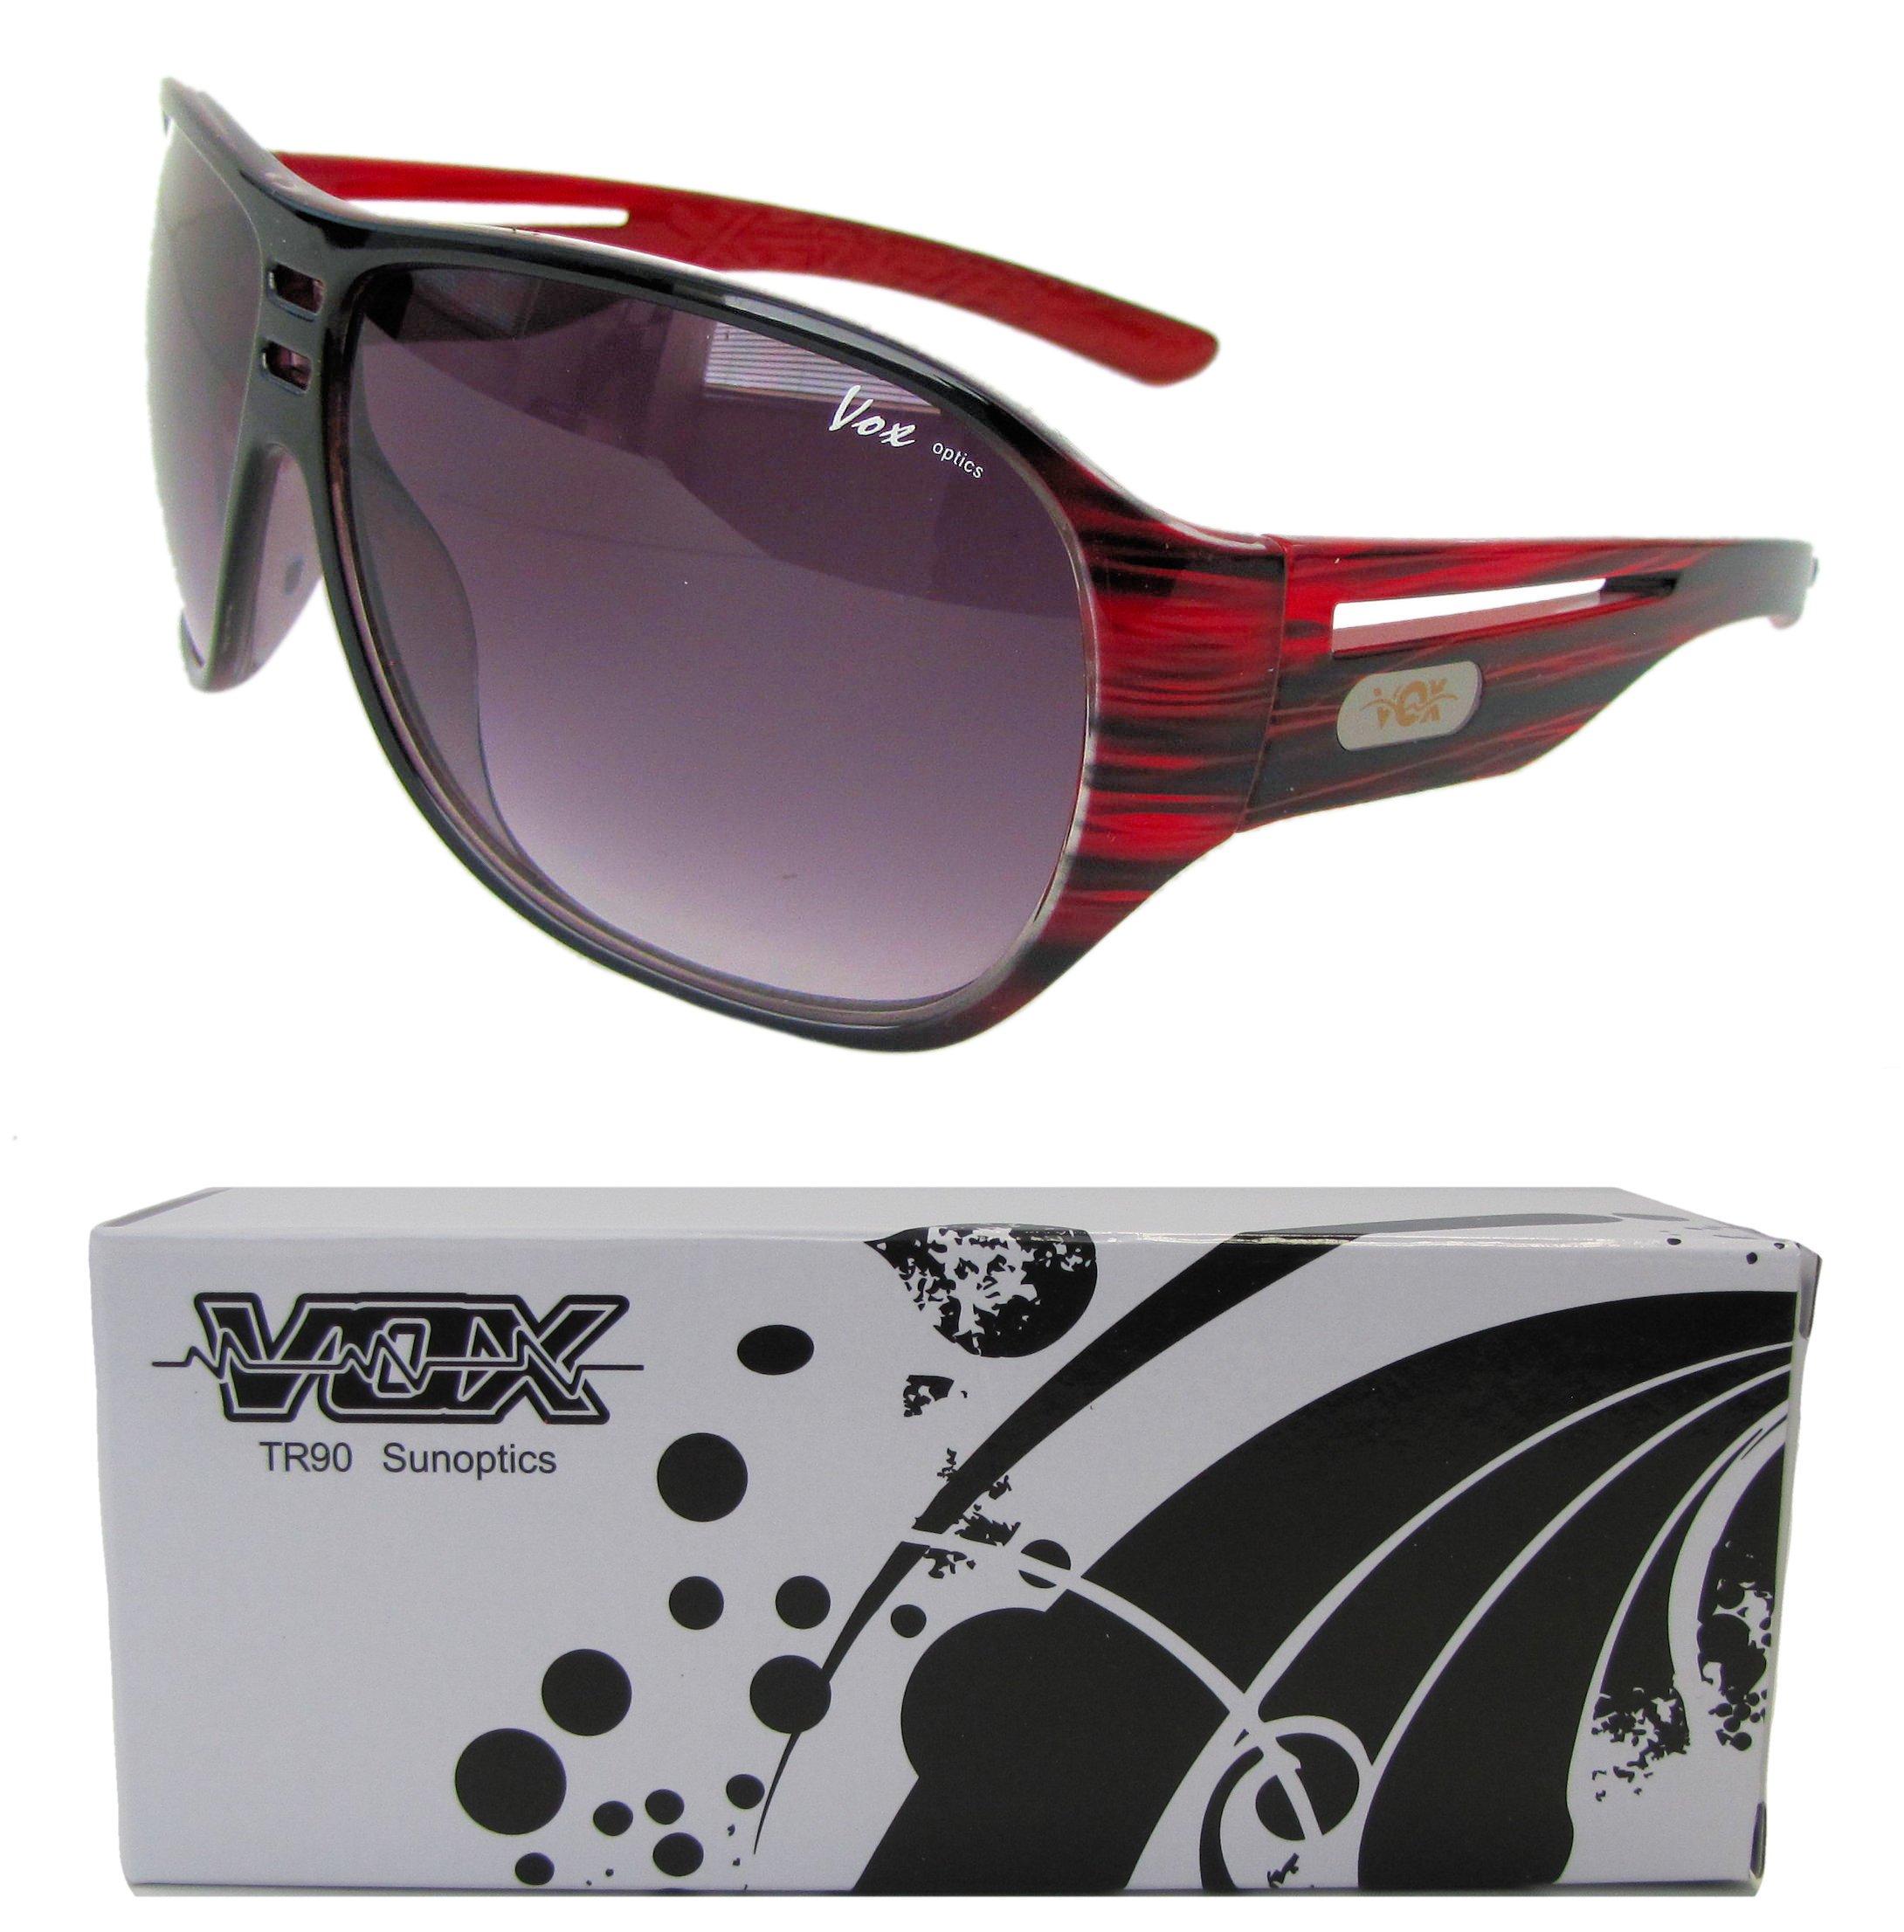 Vox TR90 Sunglasses Sport Aviator Designer Eyewear Fashion Unbreakable - Red & Black Frame - Smoke Lens